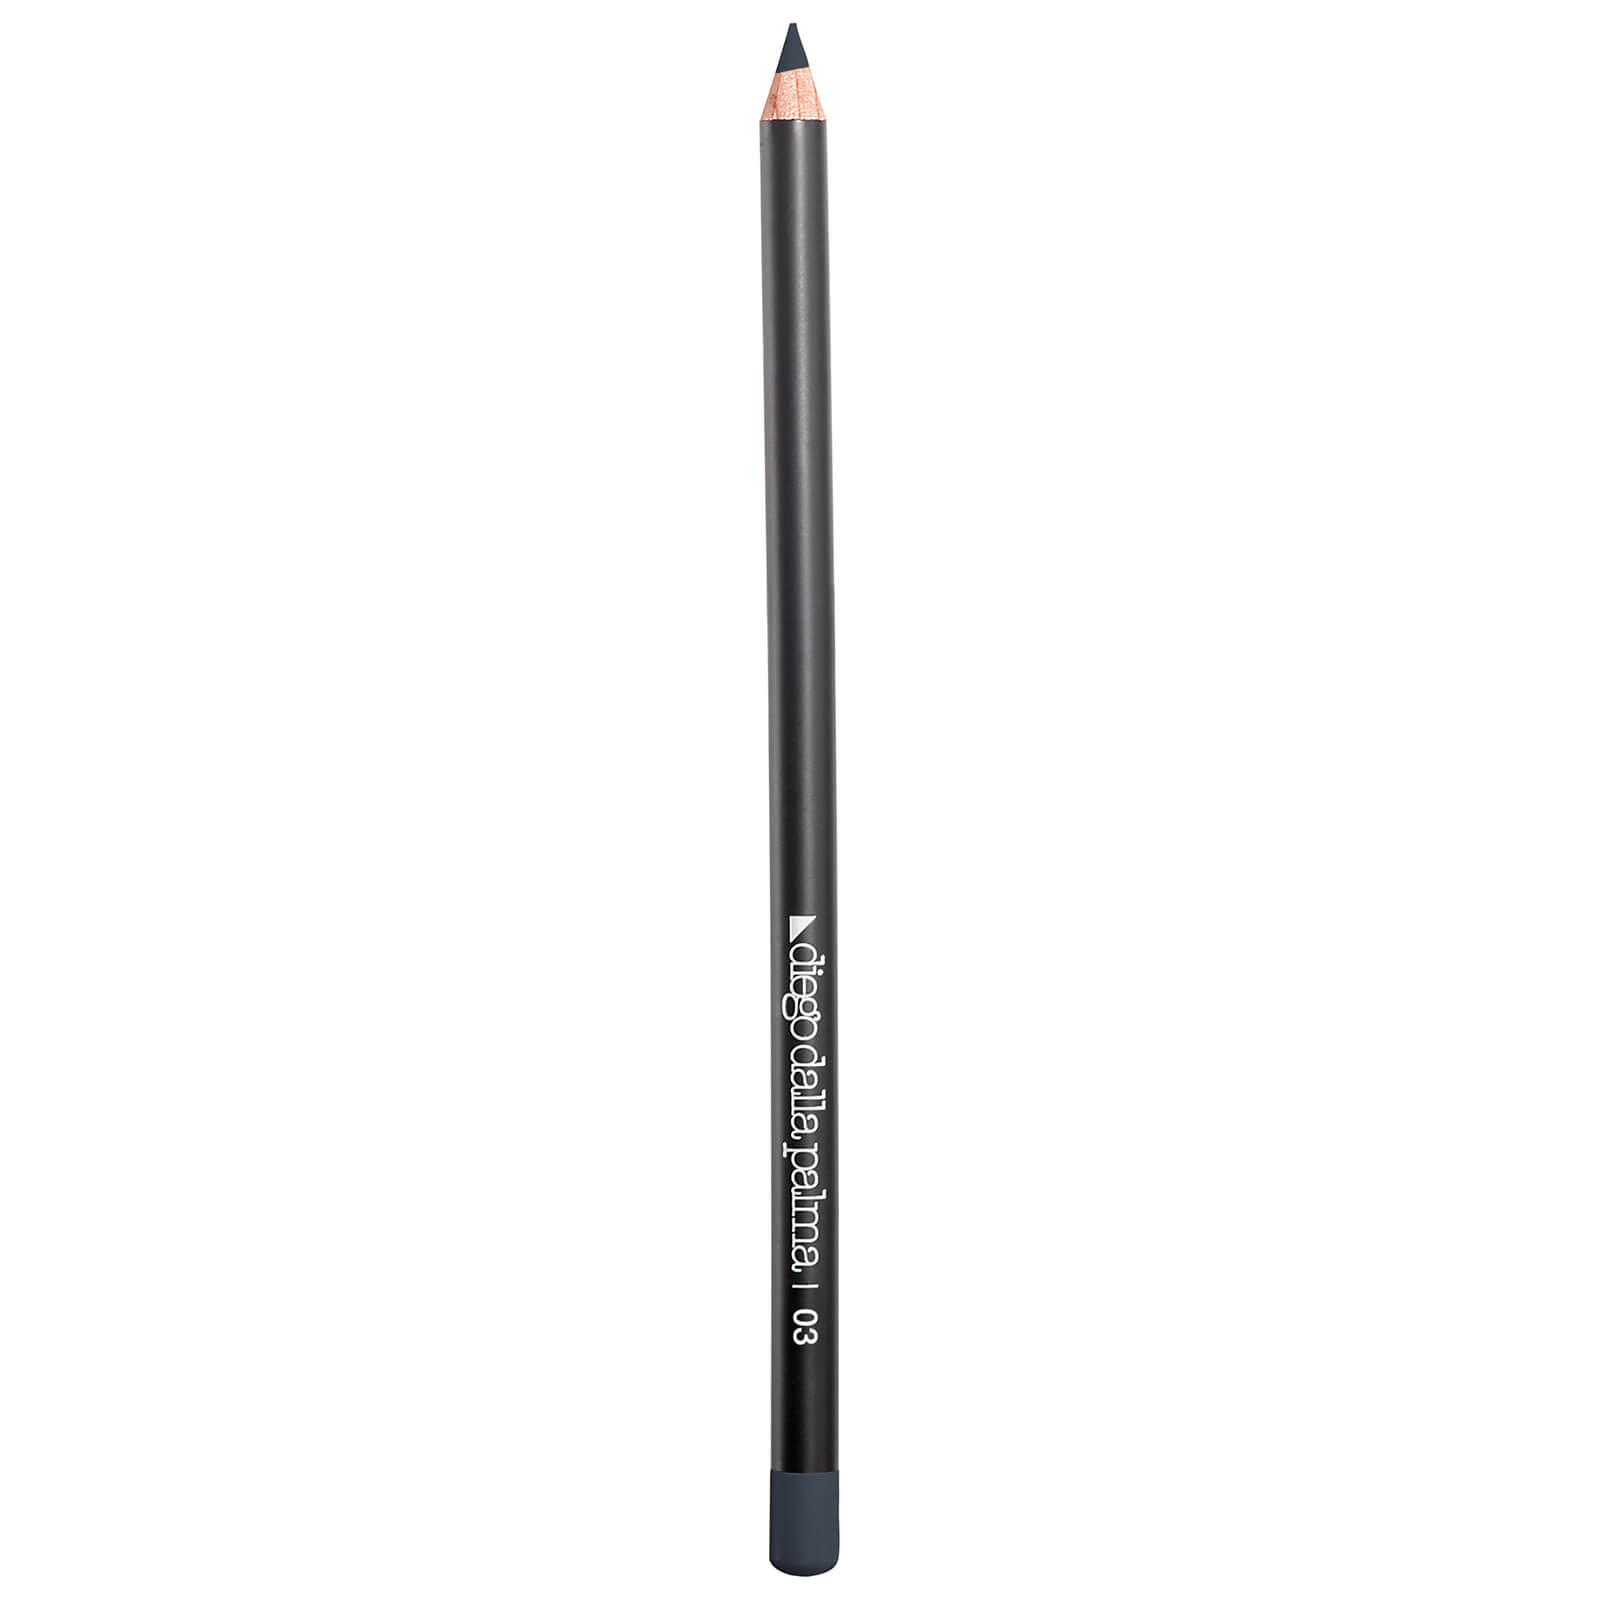 Купить Карандаш для глаз diego dalla palma Eye Pencil 2, 5 мл (различные оттенки) - Grey